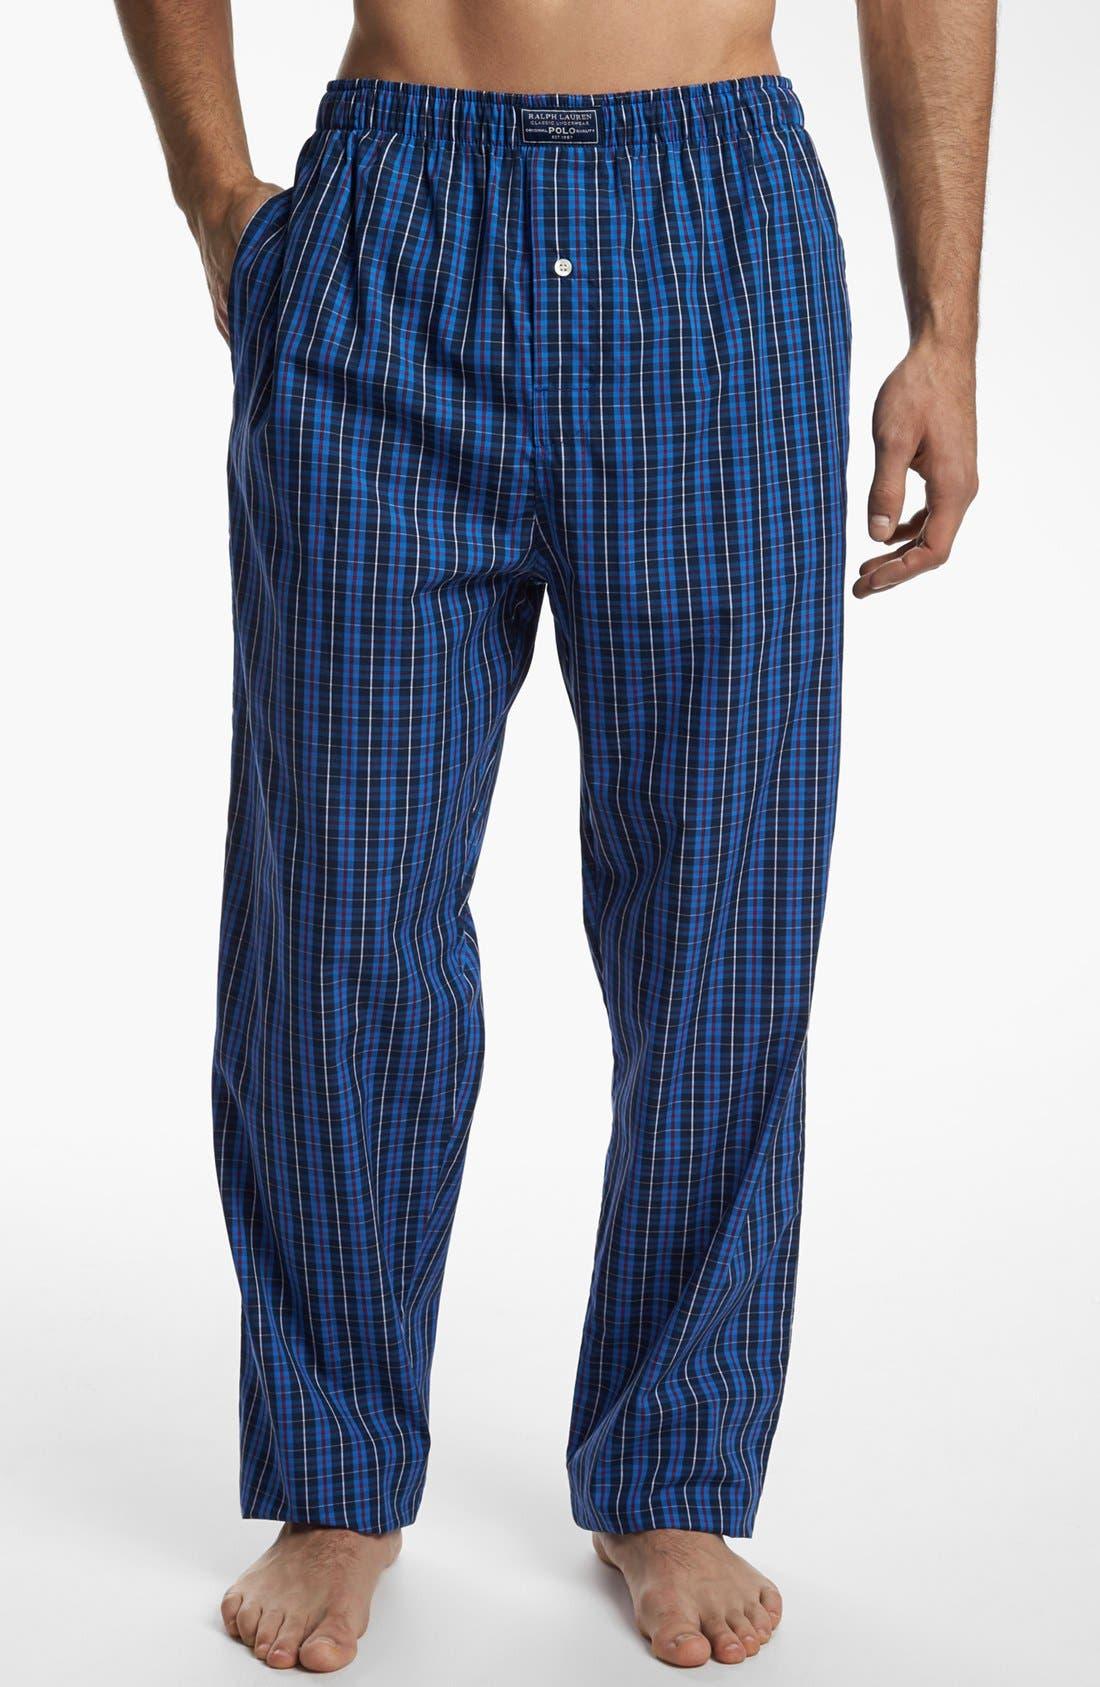 POLO RALPH LAUREN Woven Pajama Pants, Main, color, HARWICH PLAID